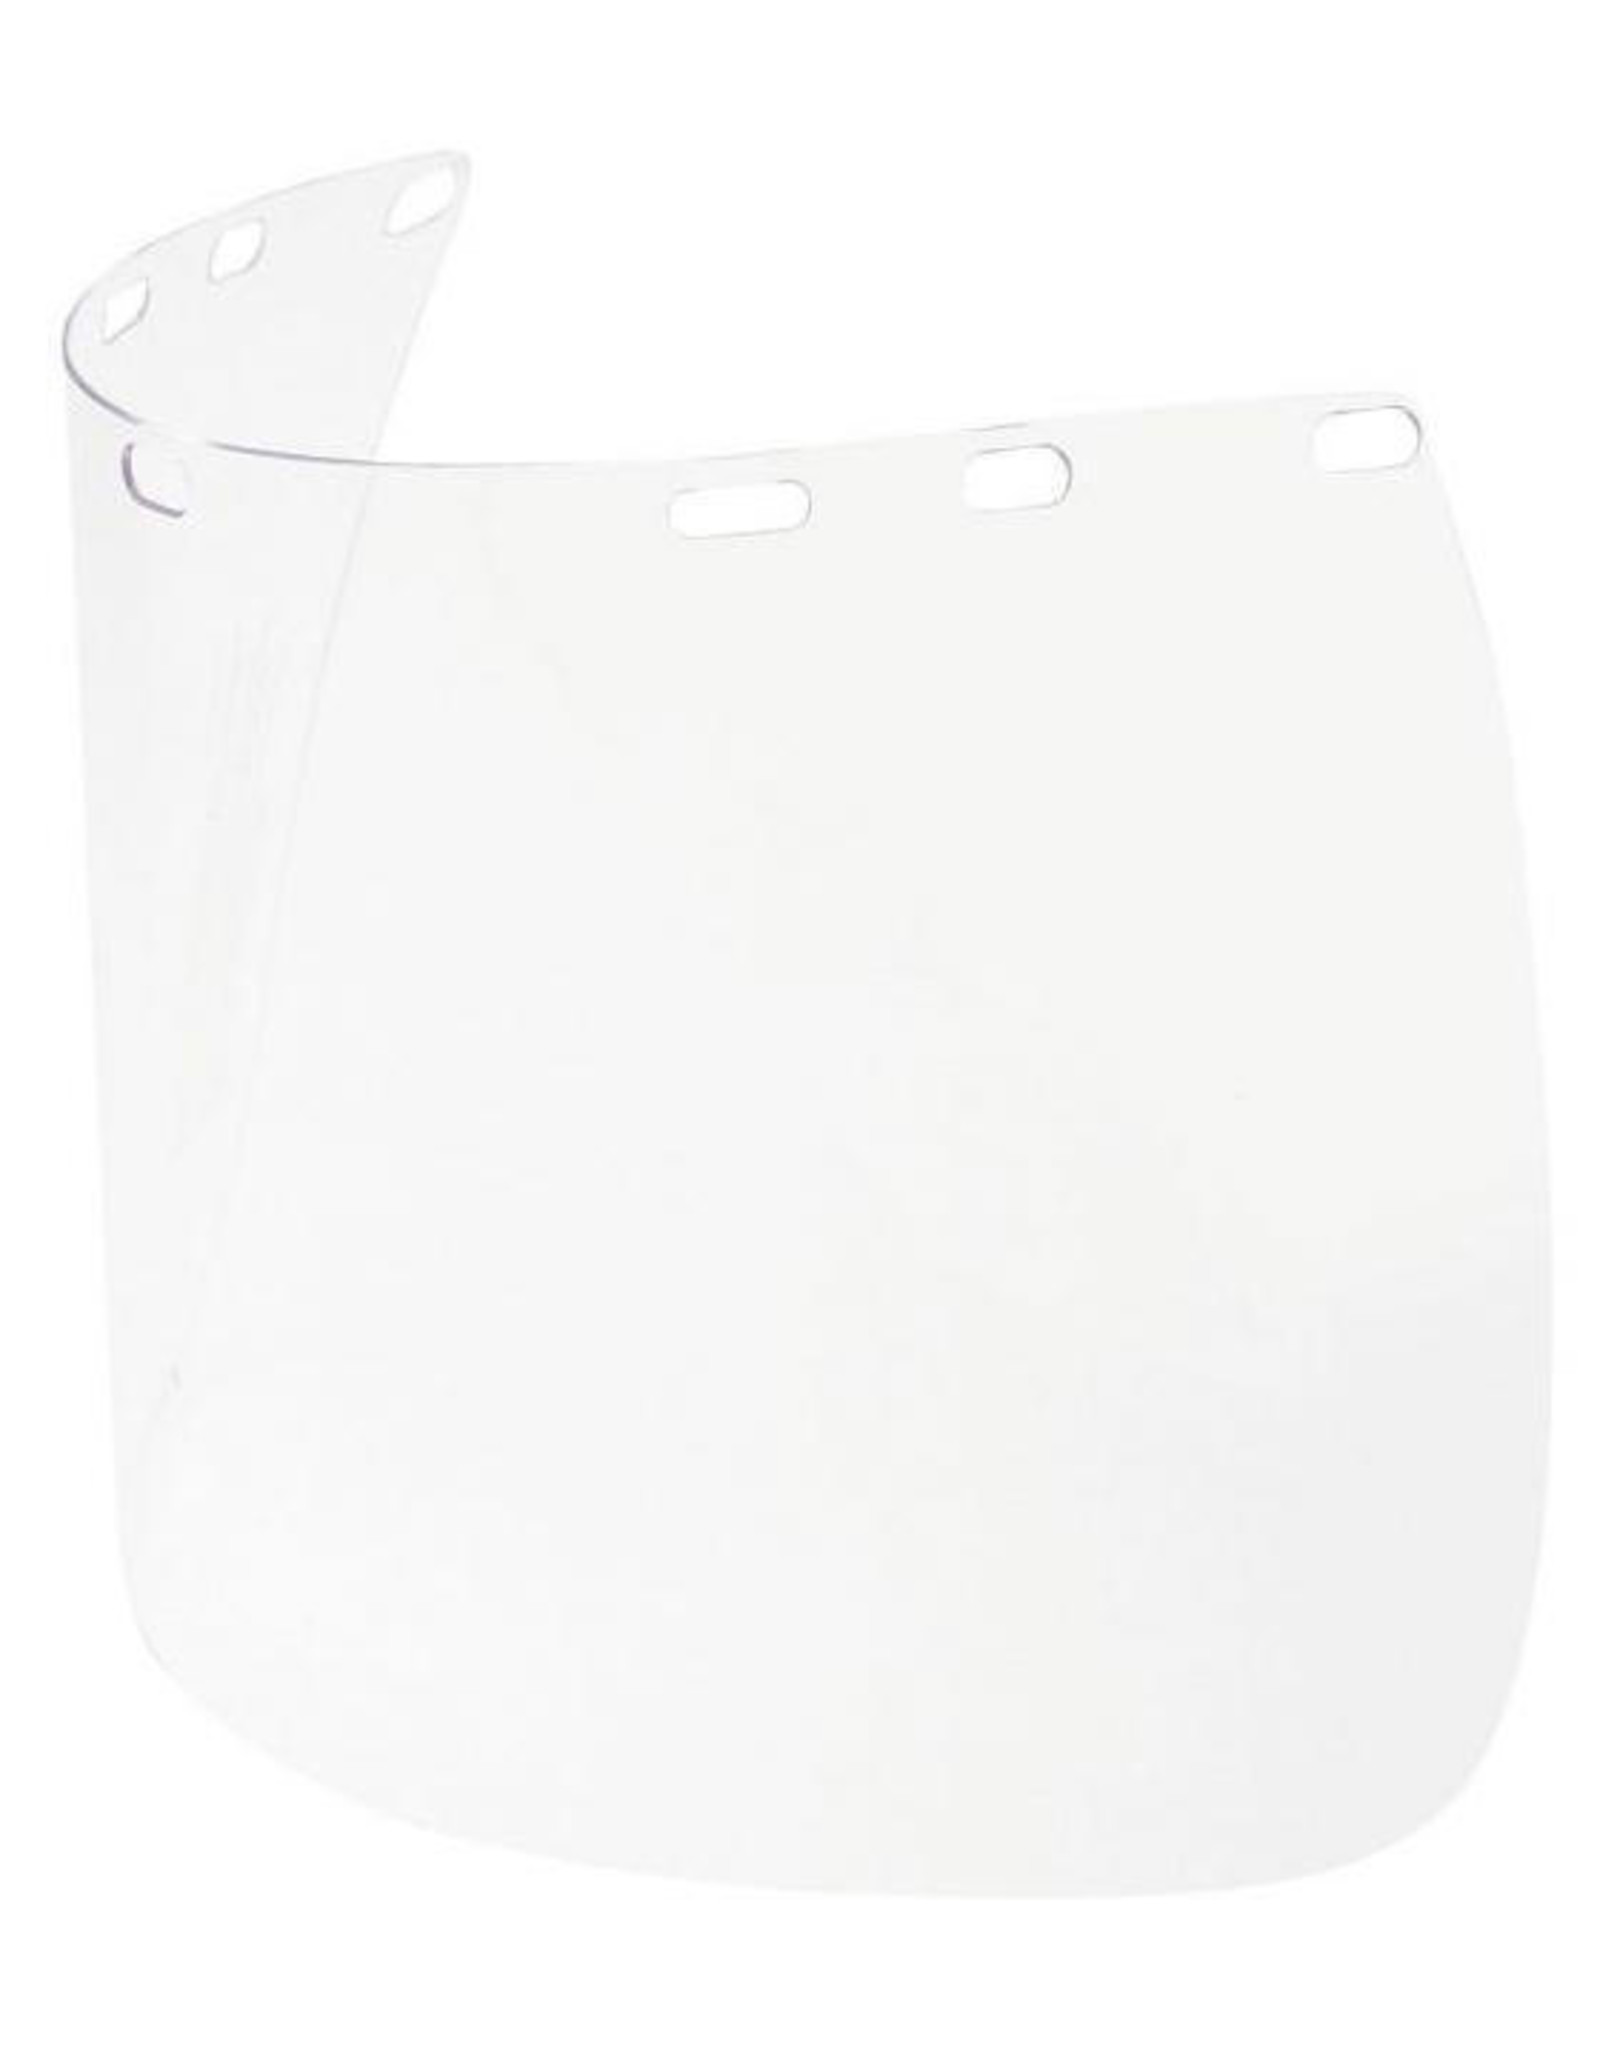 Face Shield Clear